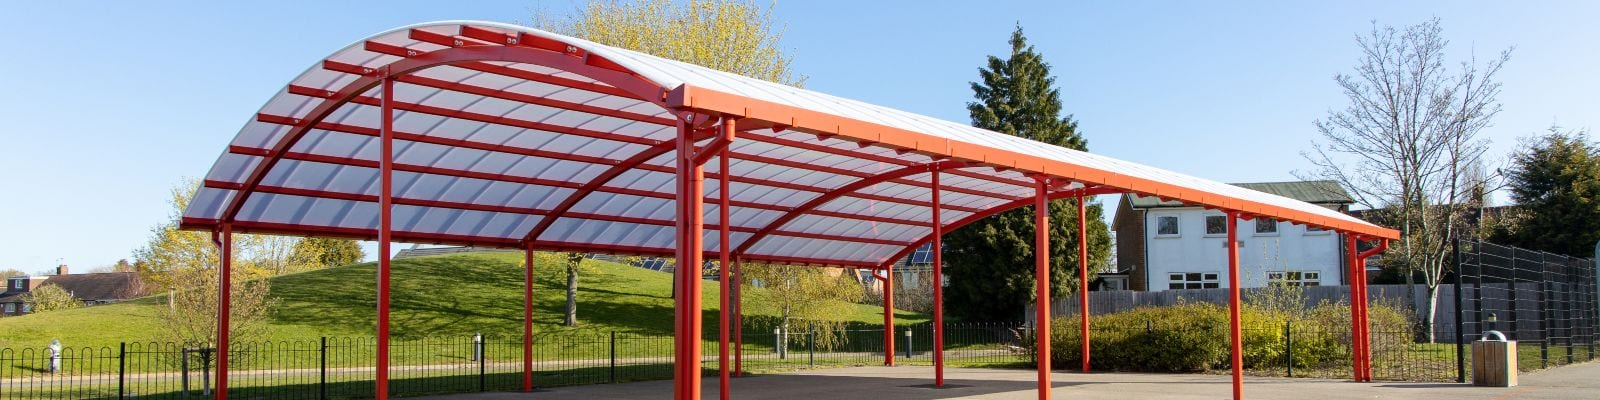 Outdoor canopy we made for King Edward Sheldon Heath Academy